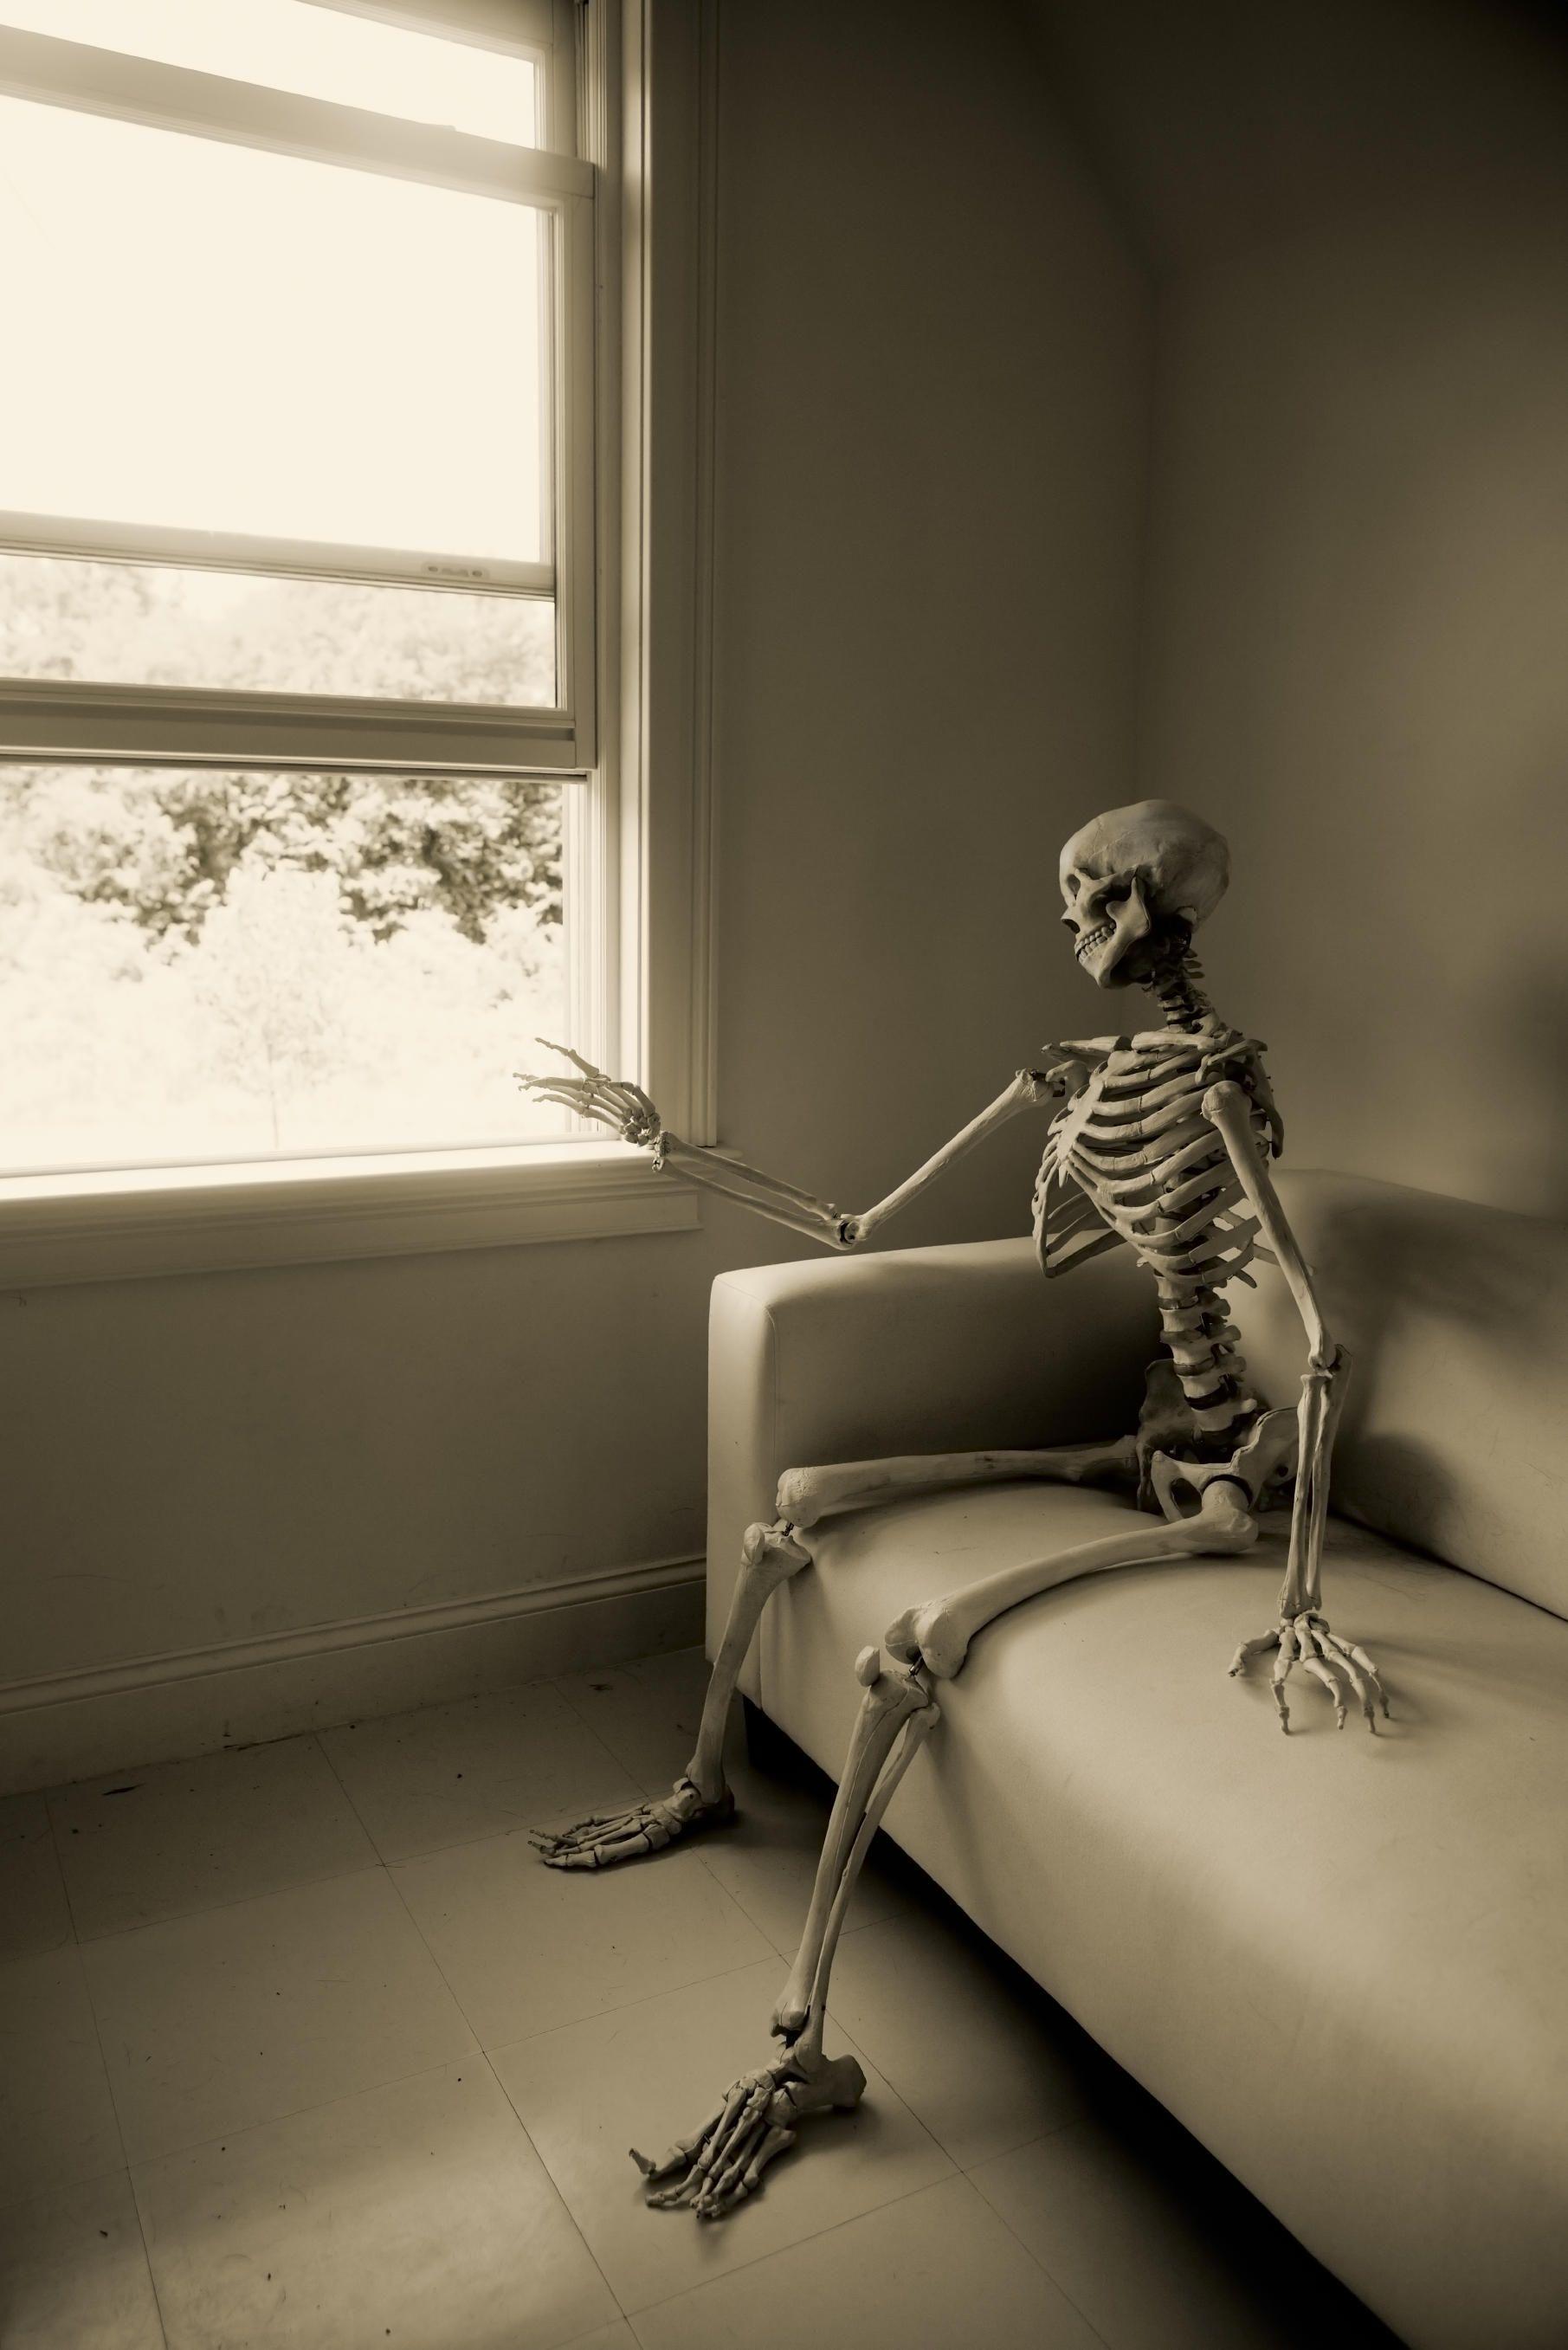 Waiting For My Girlfriend Meme